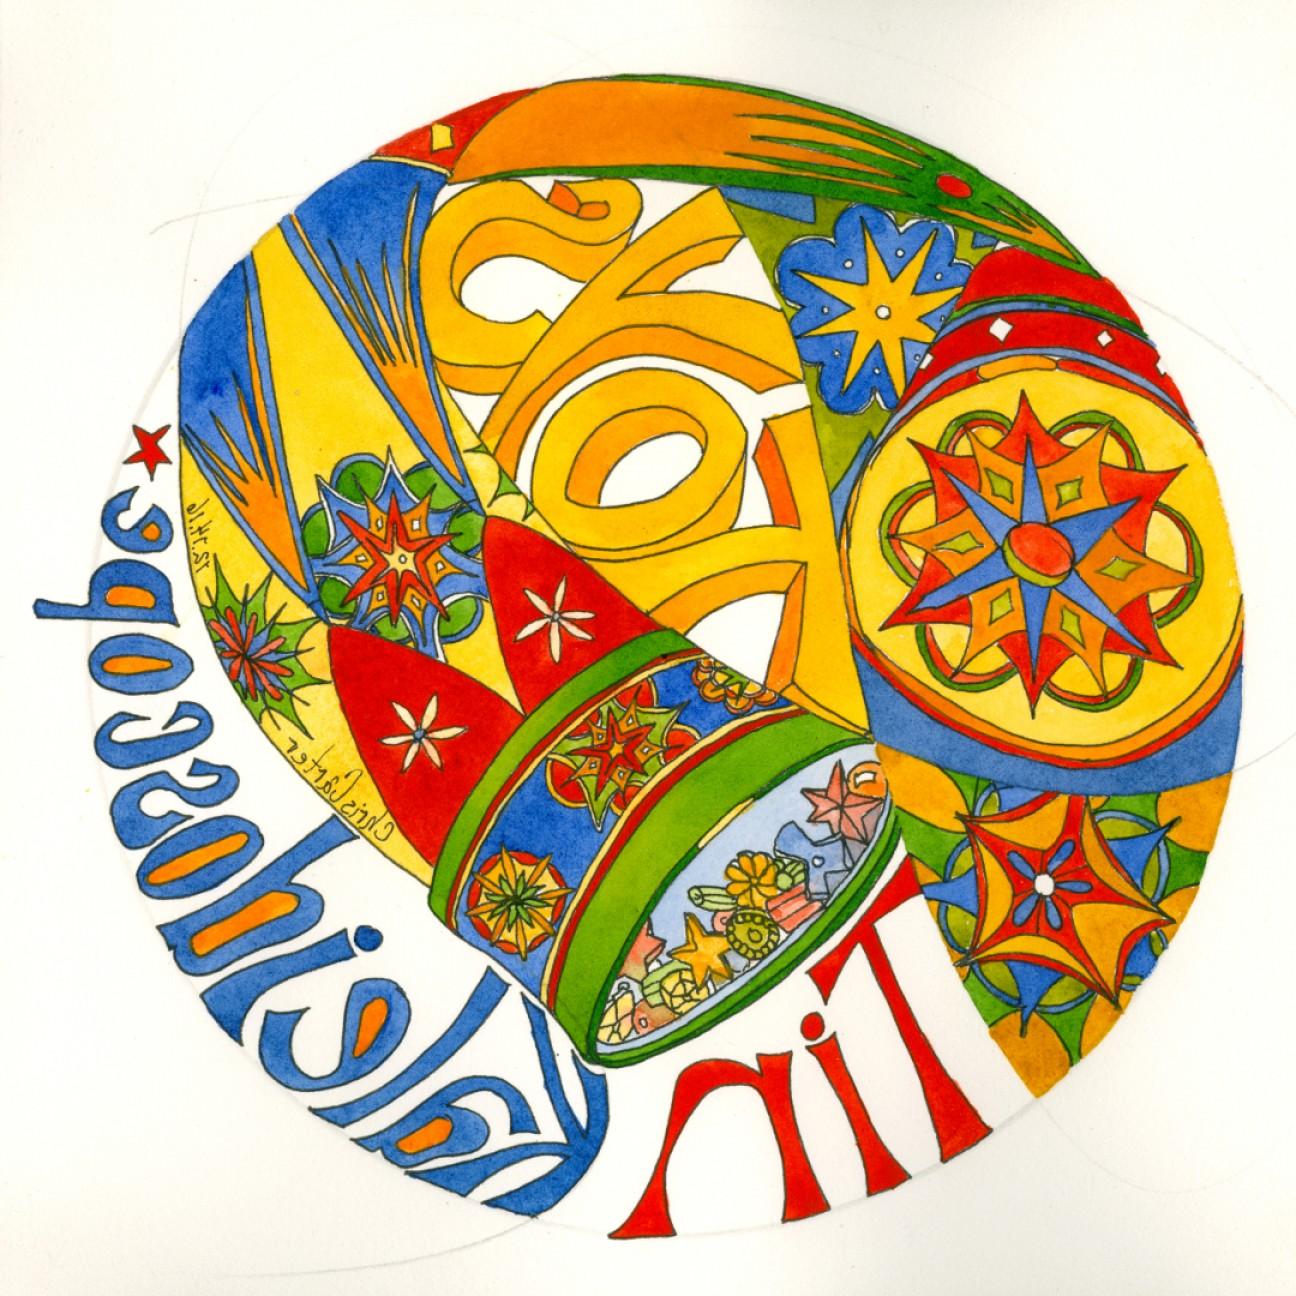 1296x1296 Color Scheme Game Dala Art Drawing Kaleidoscope Dala Ardiafm